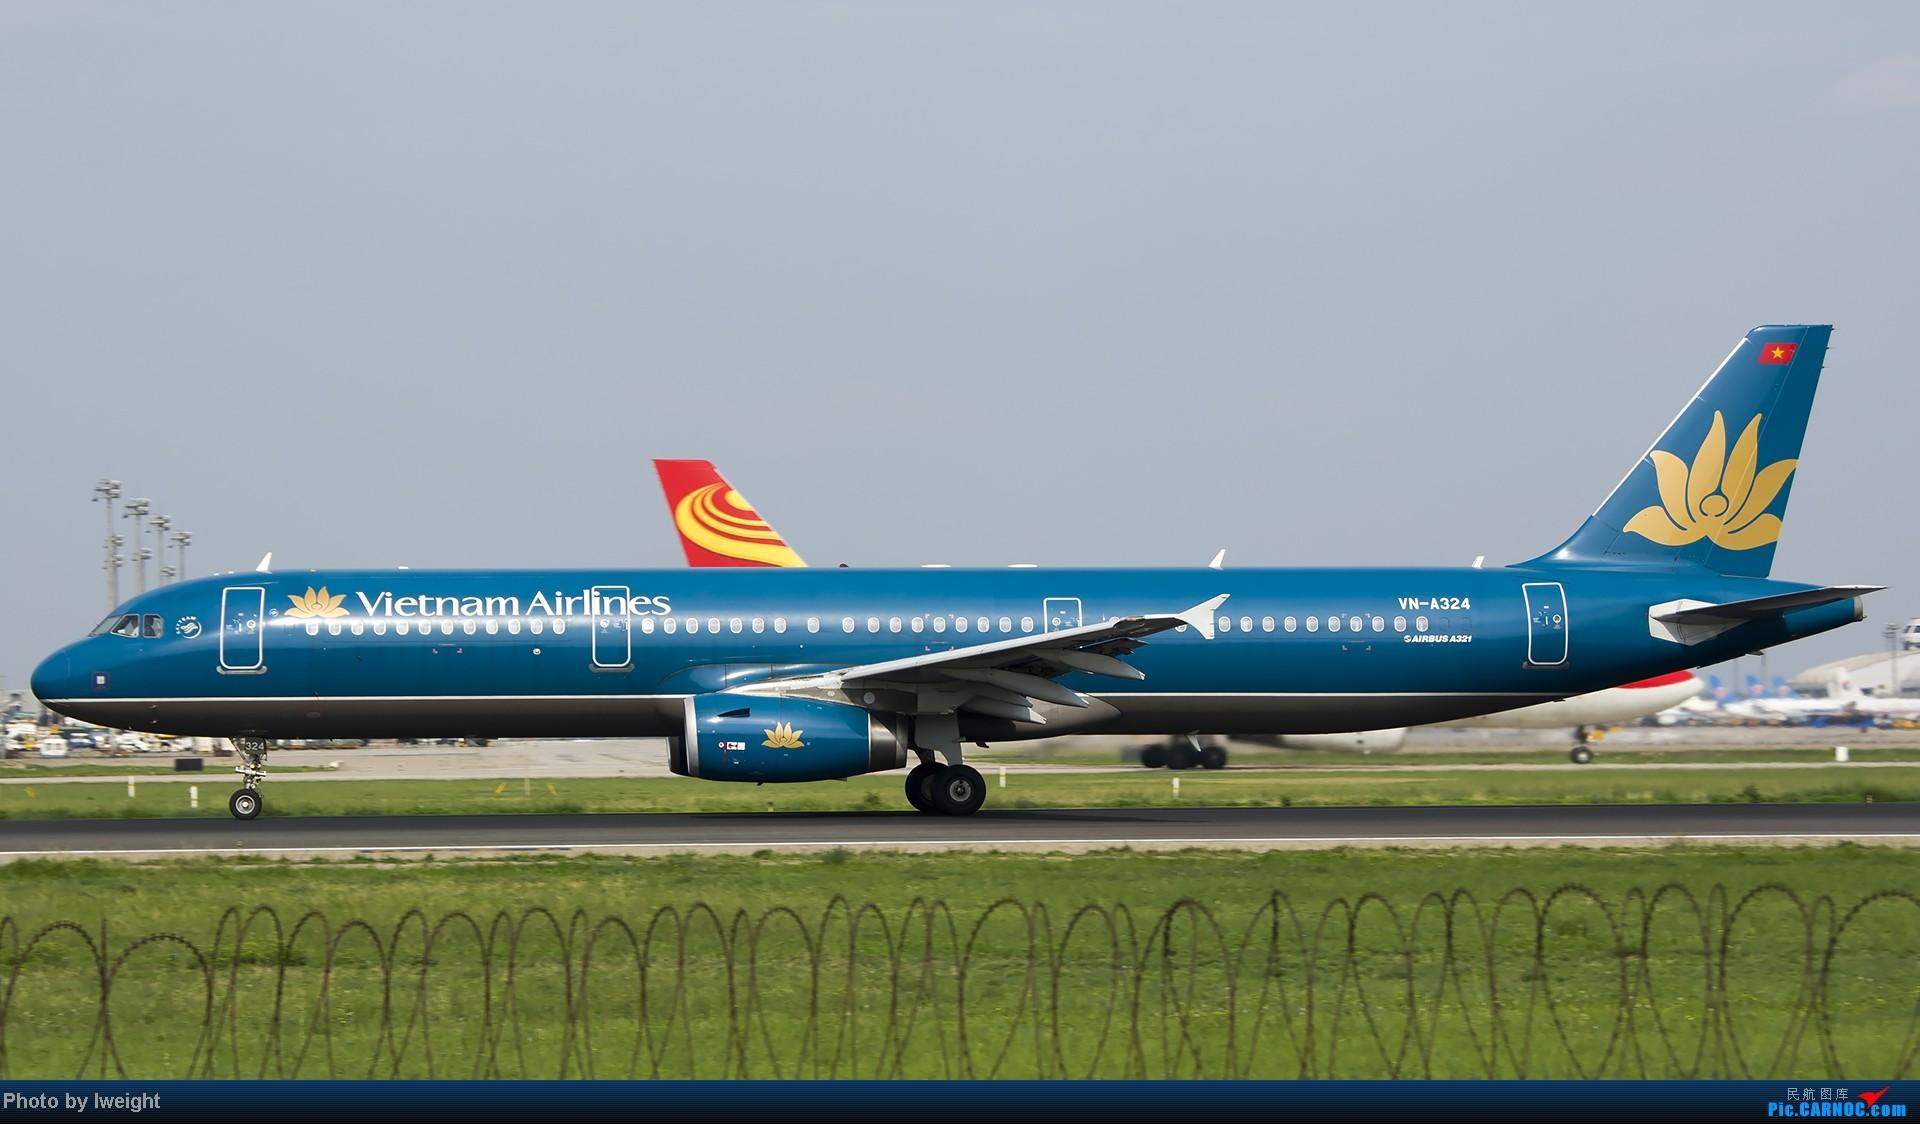 Re:[原创]20号下午机场随拍(国内最新的787-8) AIRBUS A321-200 VN-A324 中国北京首都机场